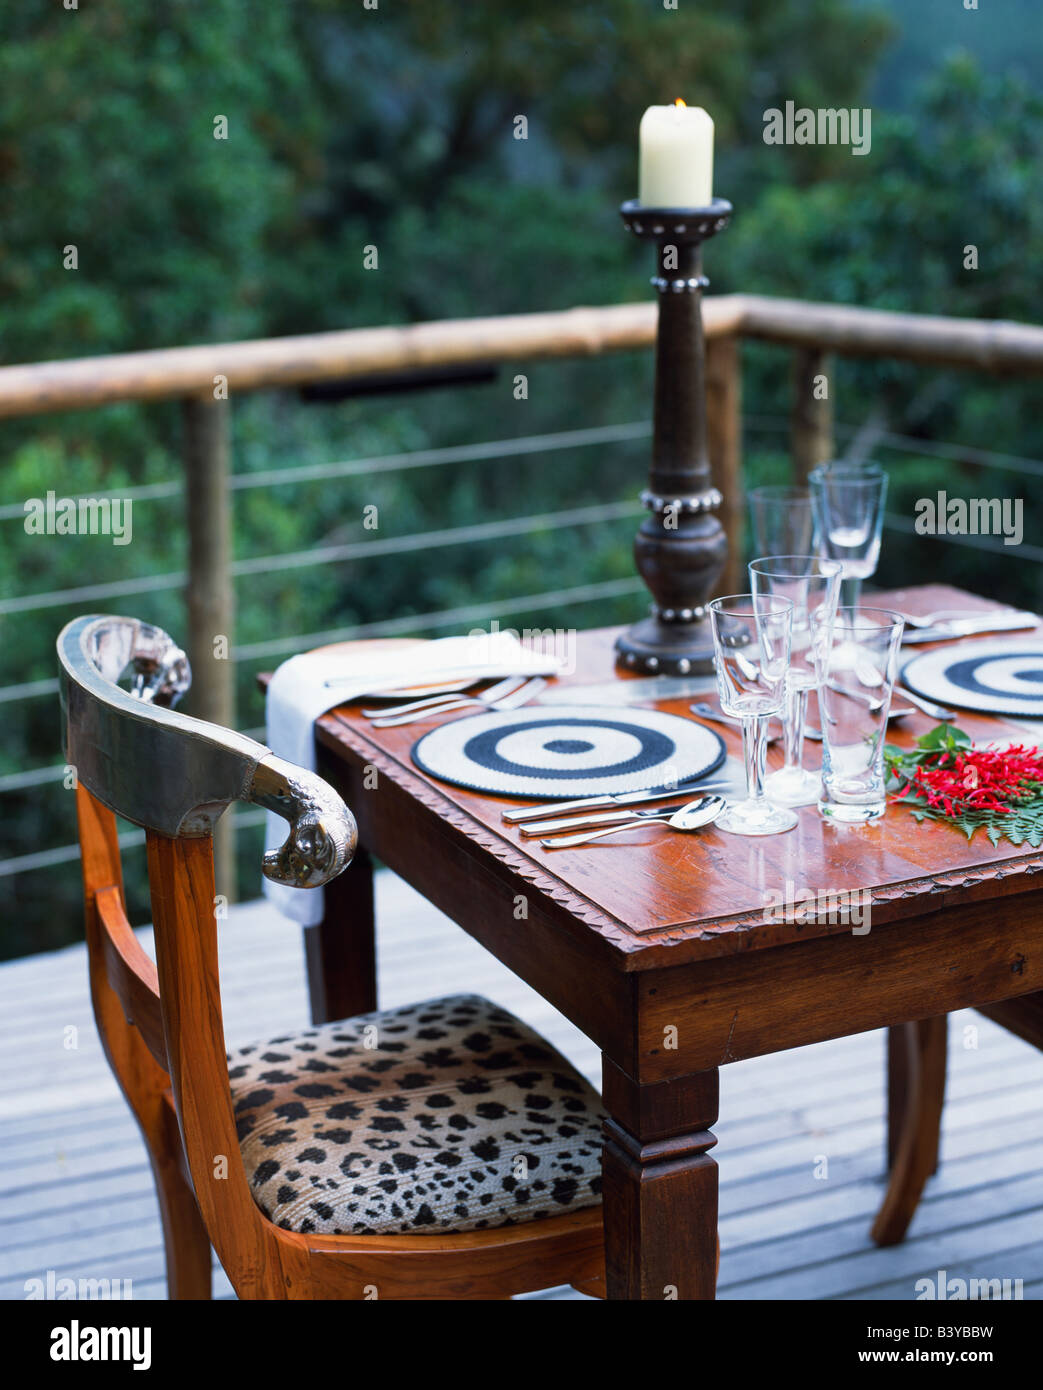 South Africa Western Cape Plettenberg Bay Tsala Treetop Lodge Dining On The Deck